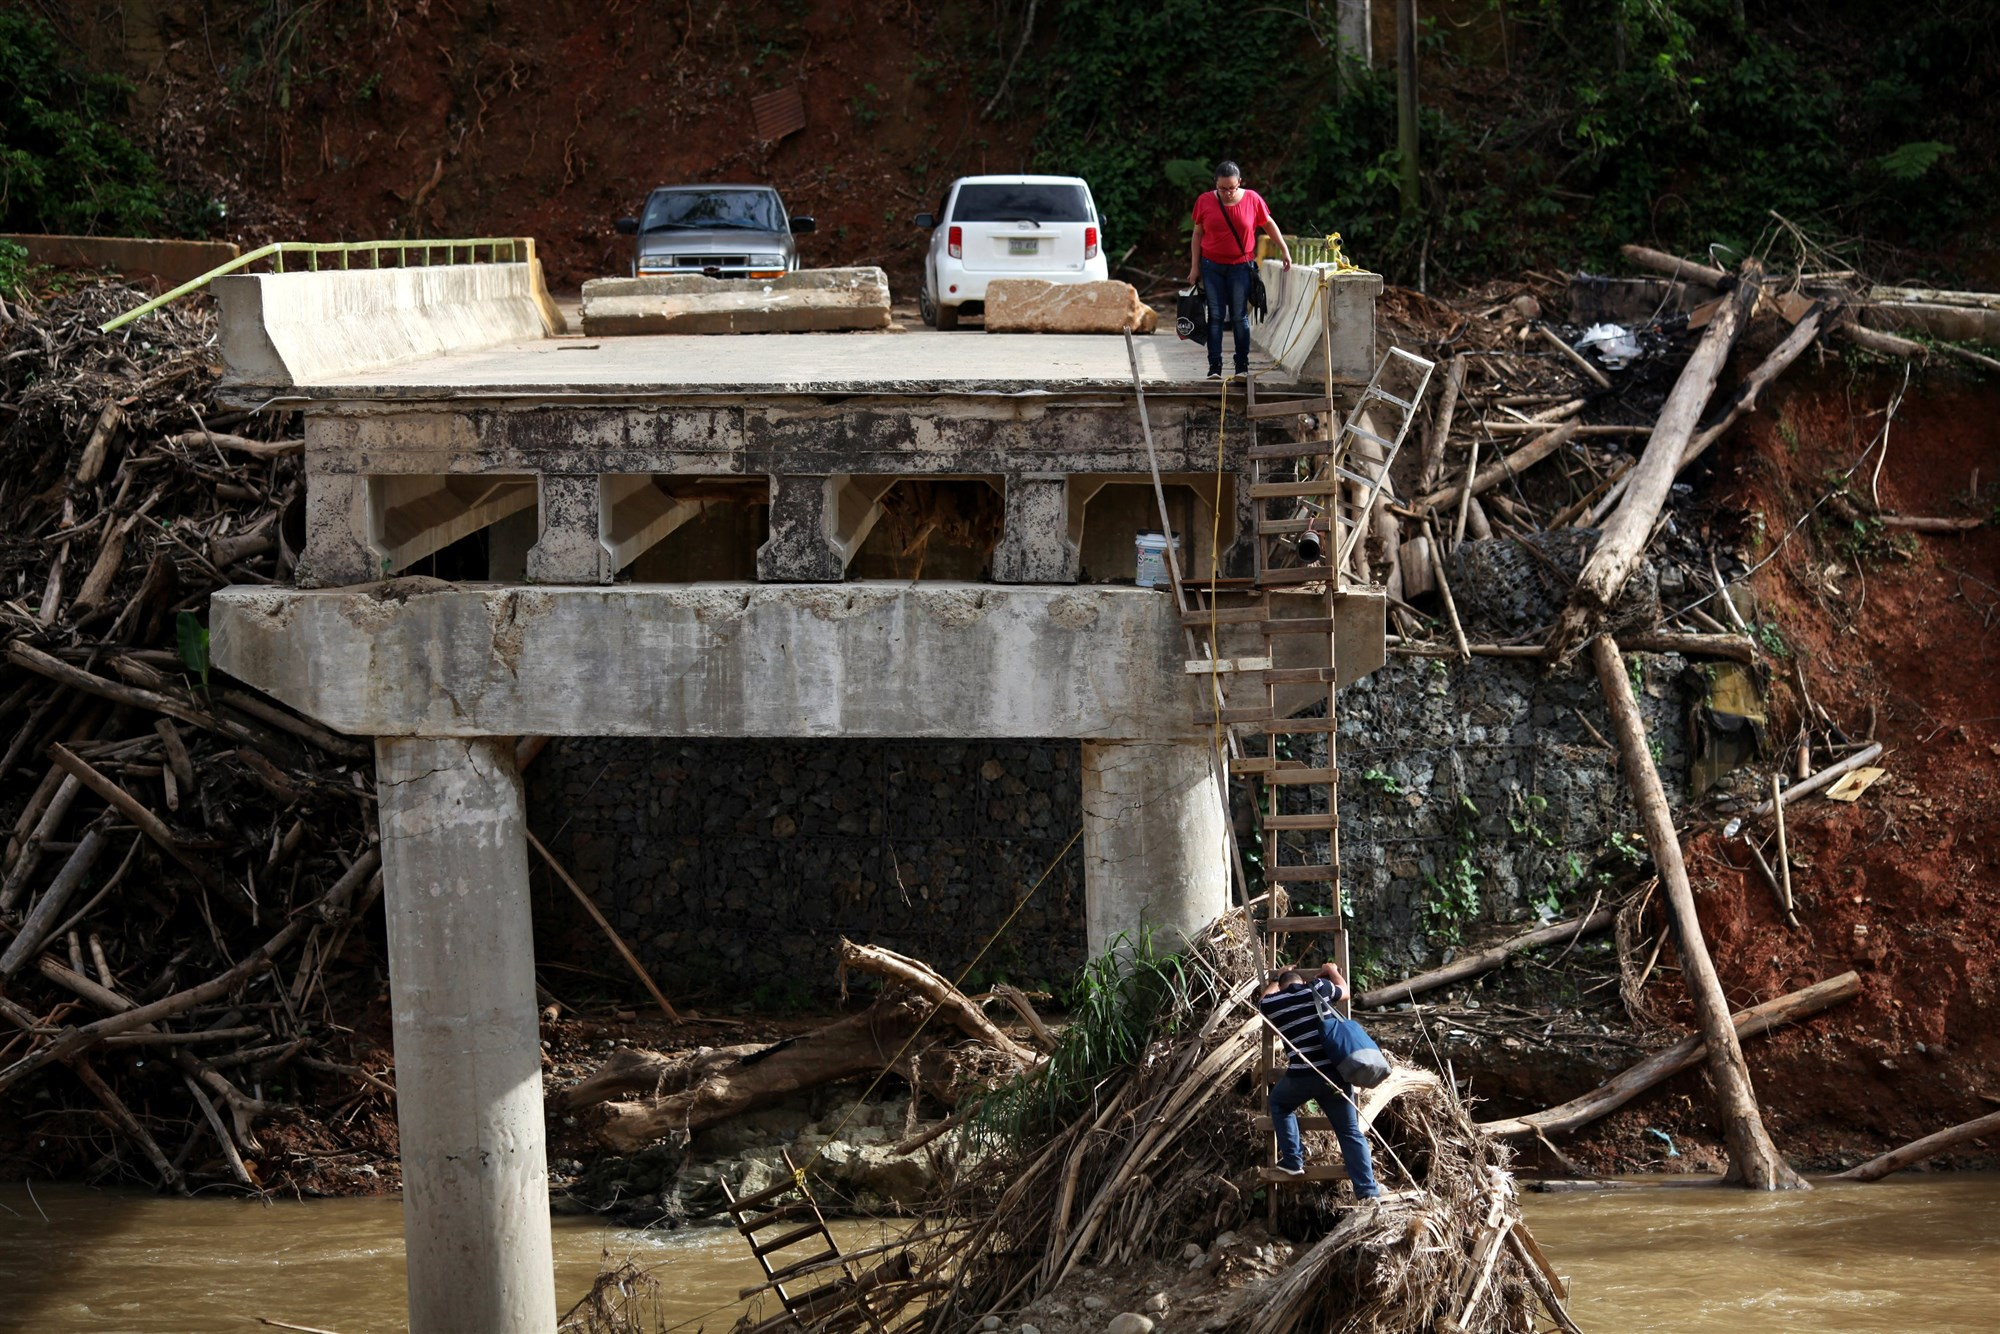 171120-puerto-rico-hurricane-maria-bridge-collapsed-sg-1321_407f5e3fe10f9e9c889c66fdc3a2c819.fit-2000w.jpg